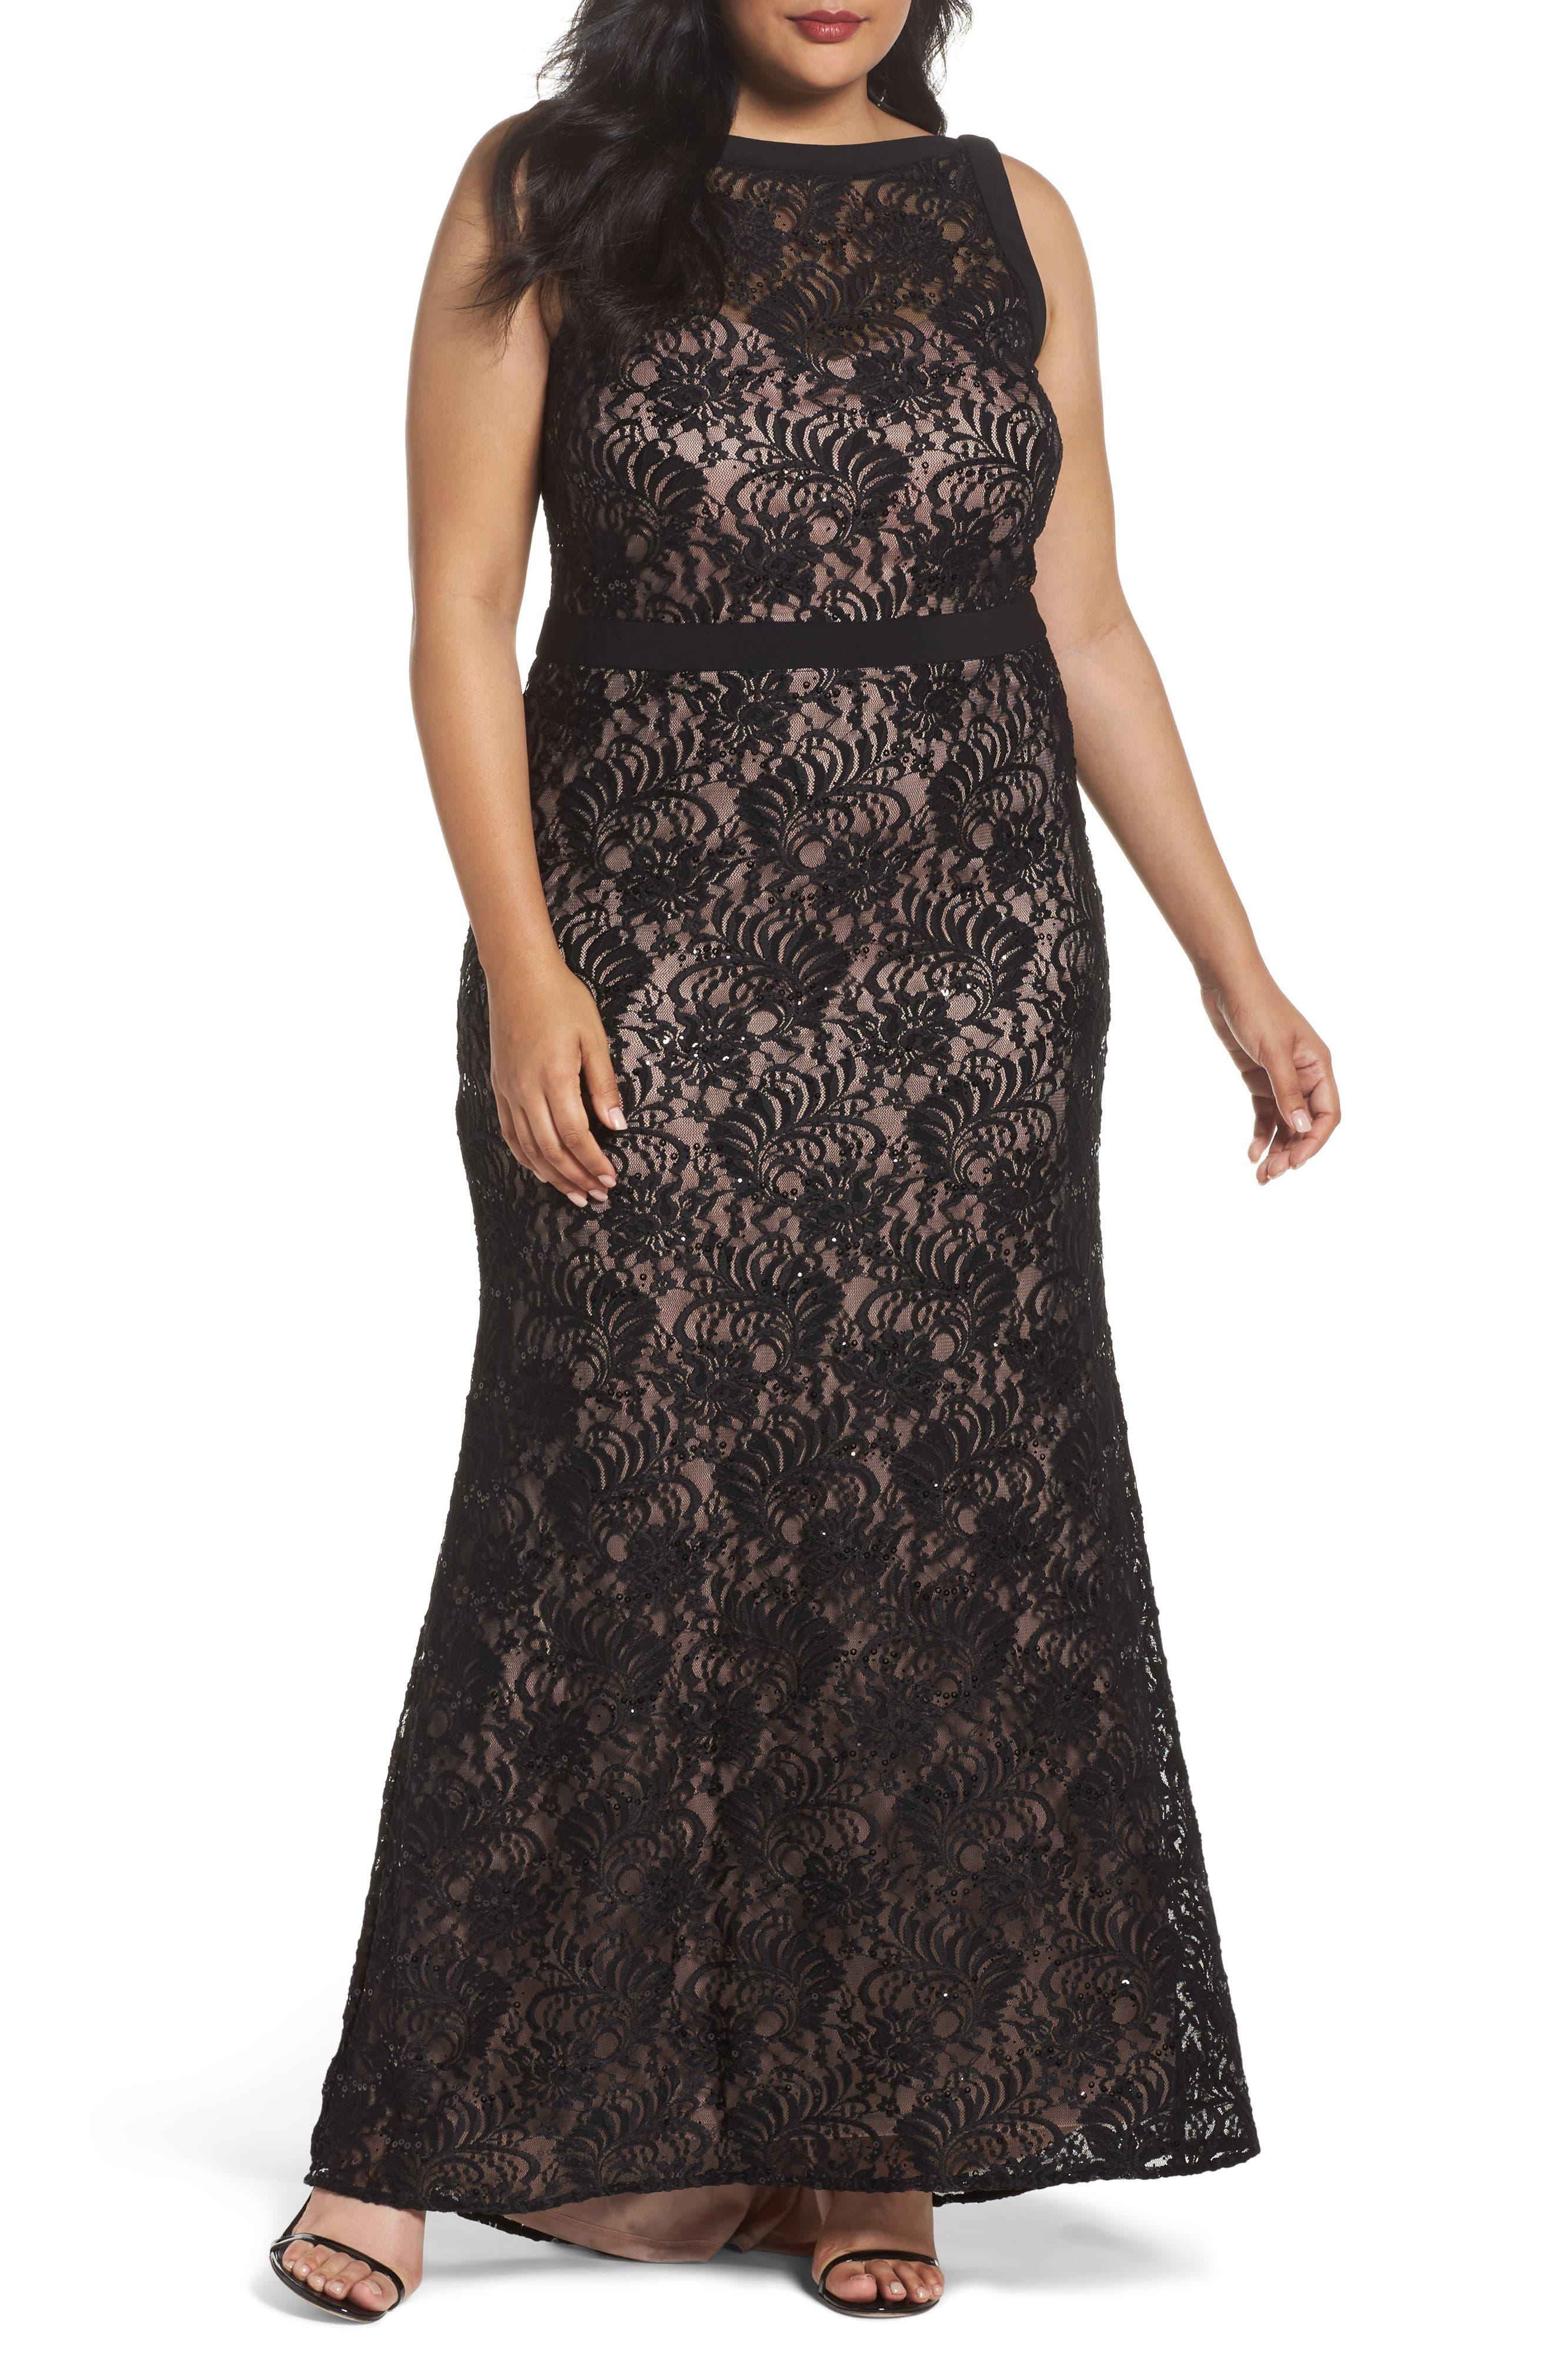 Lace Square Neck Gown,                             Main thumbnail 1, color,                             BLACK/ NUDE